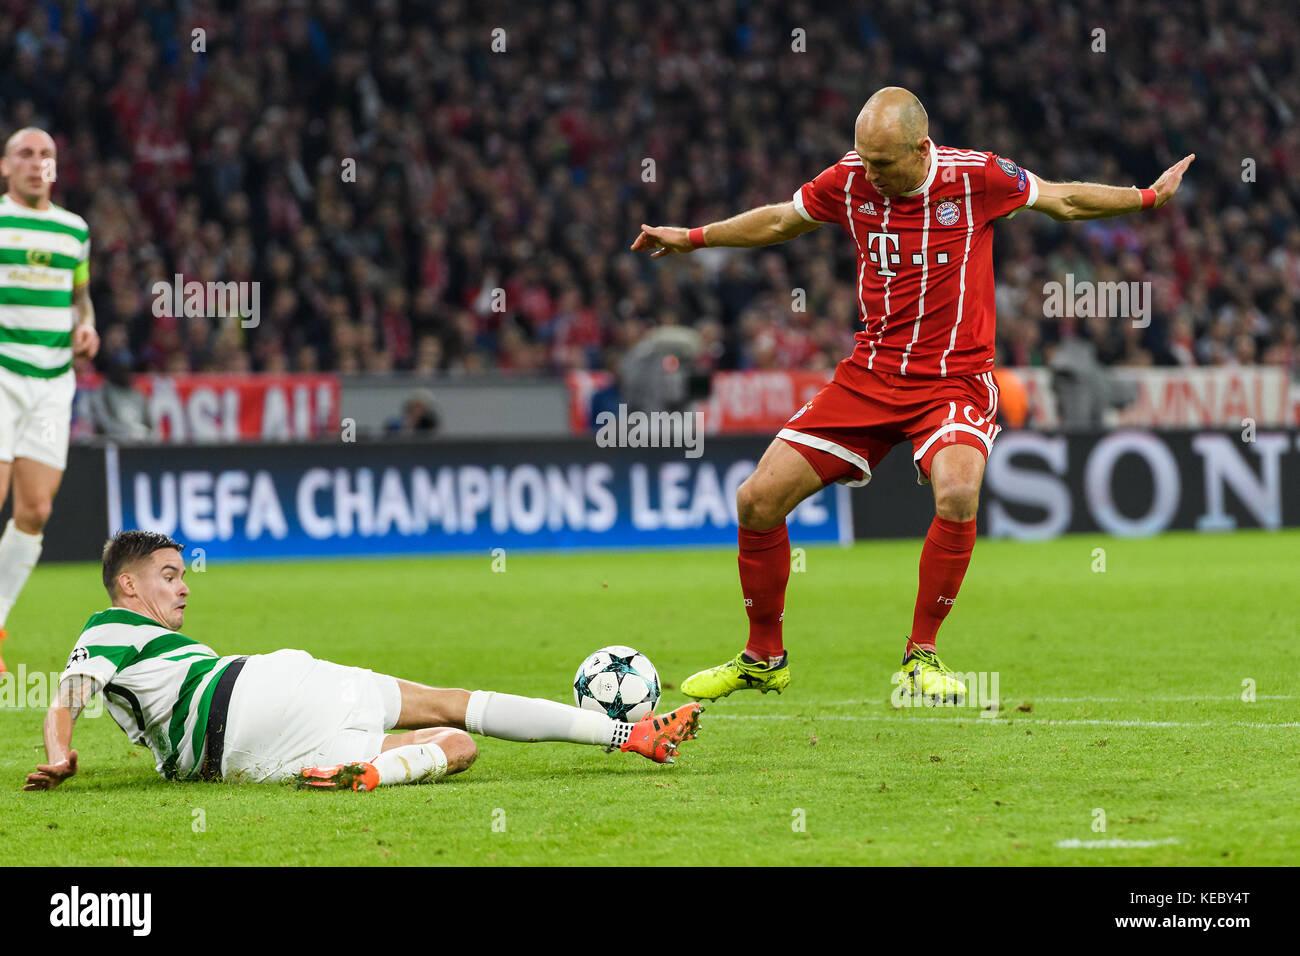 Arjen Robben Fcb Im Duels With Mikael Lustig Glasgow